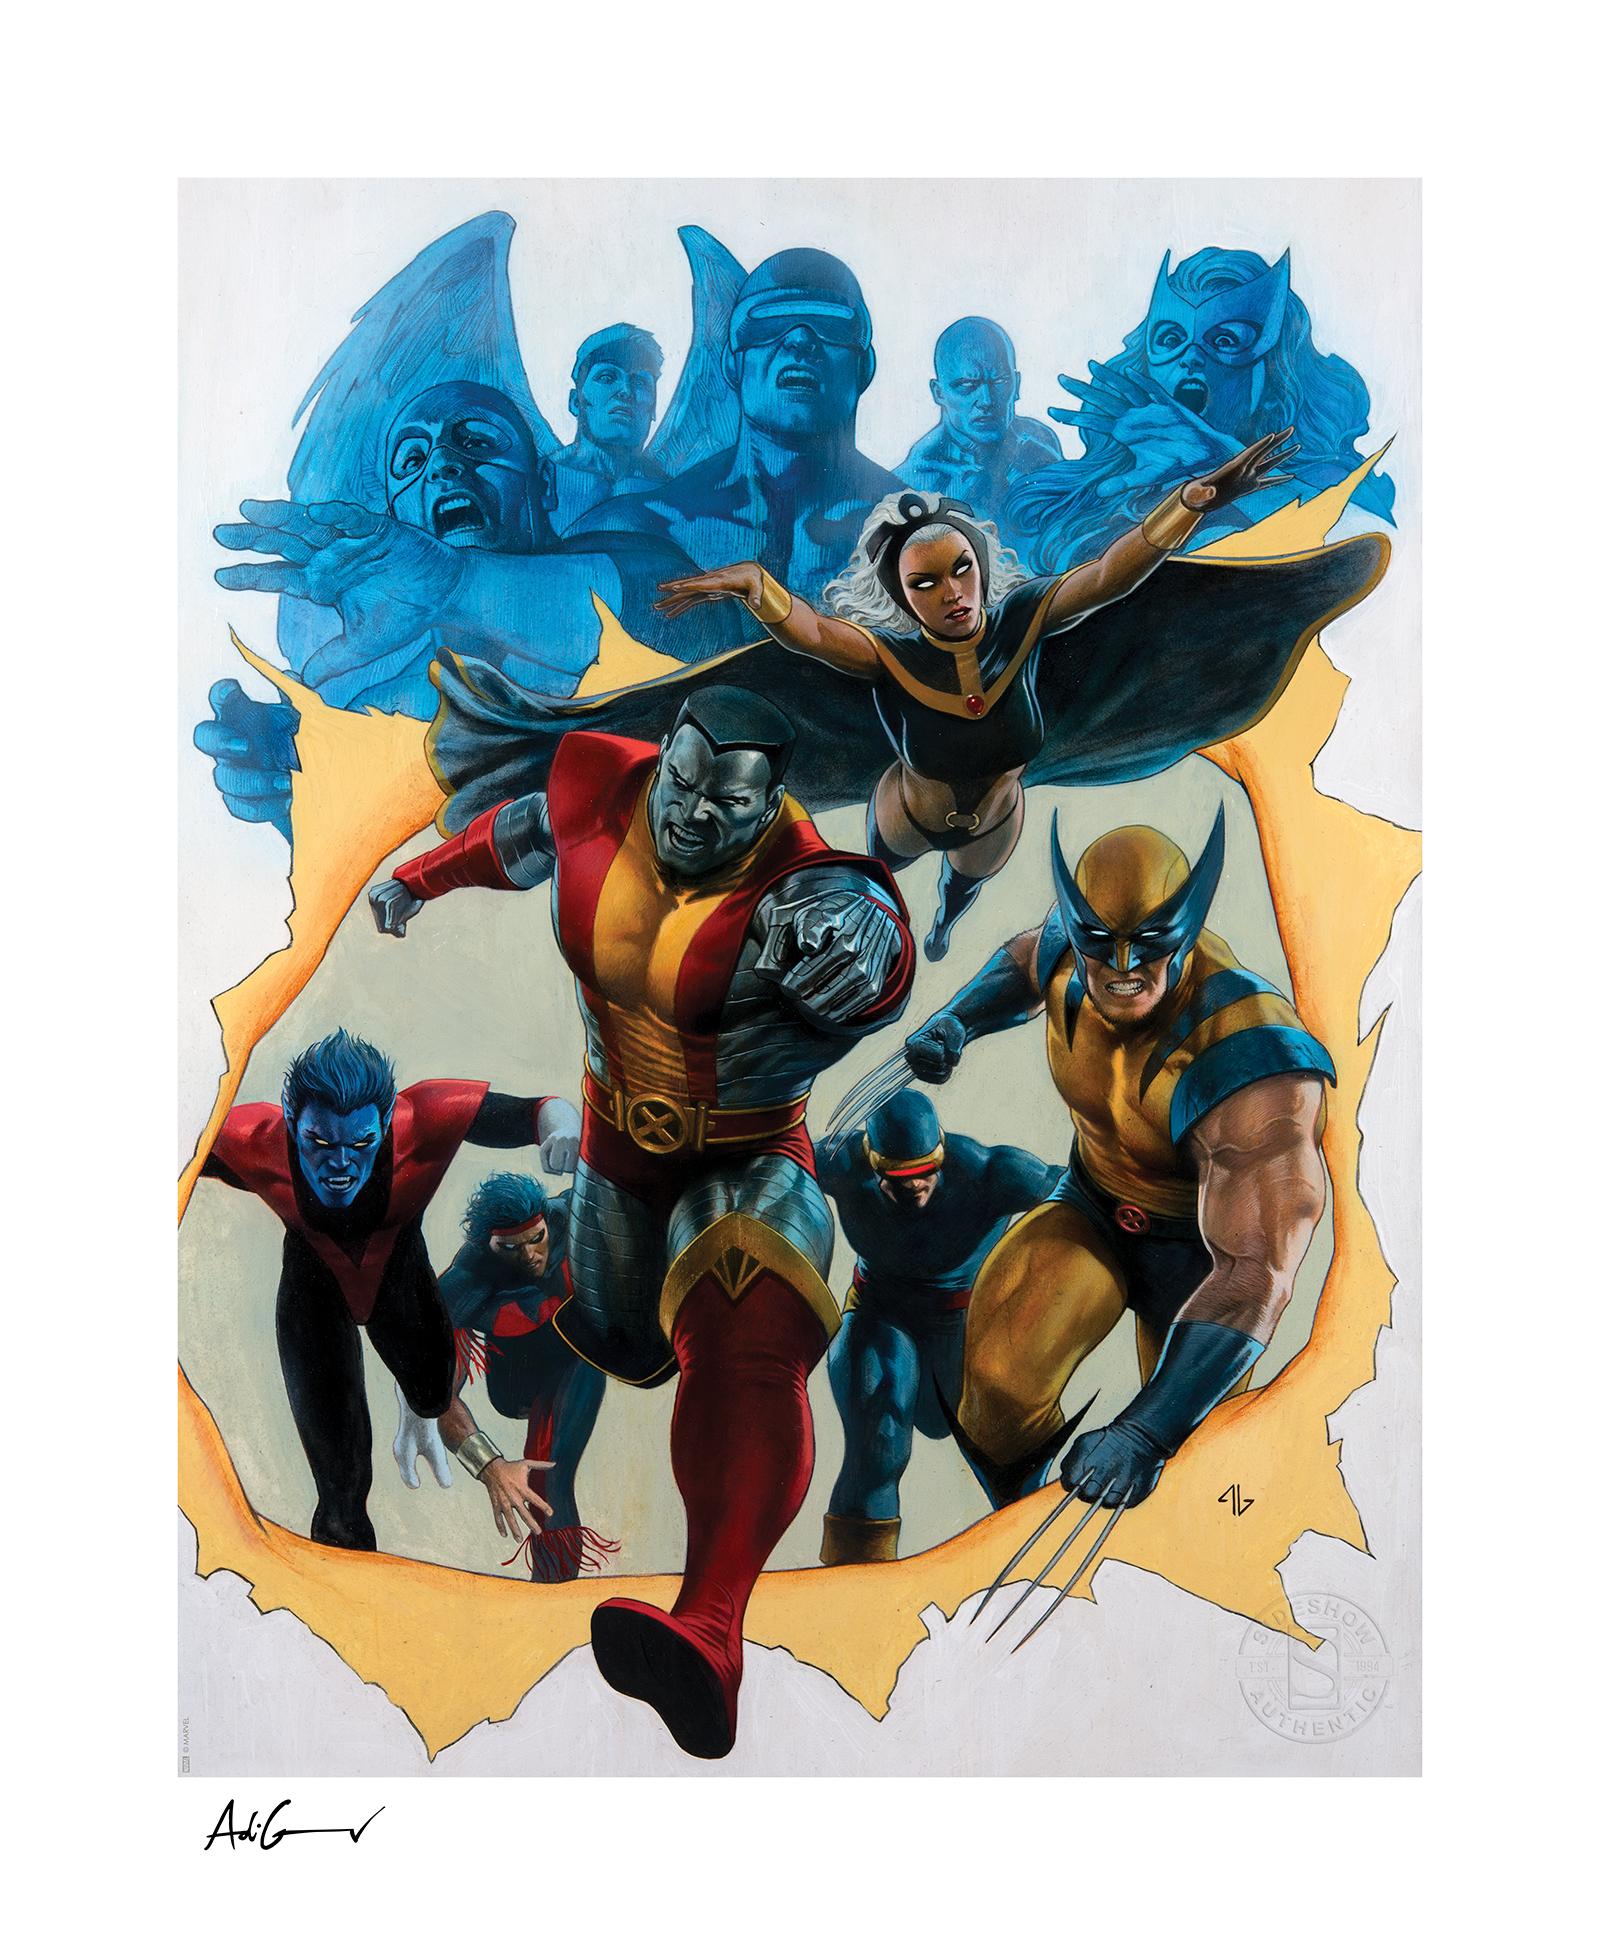 Sideshow Collectibles Giant-Size X-Men Art Print